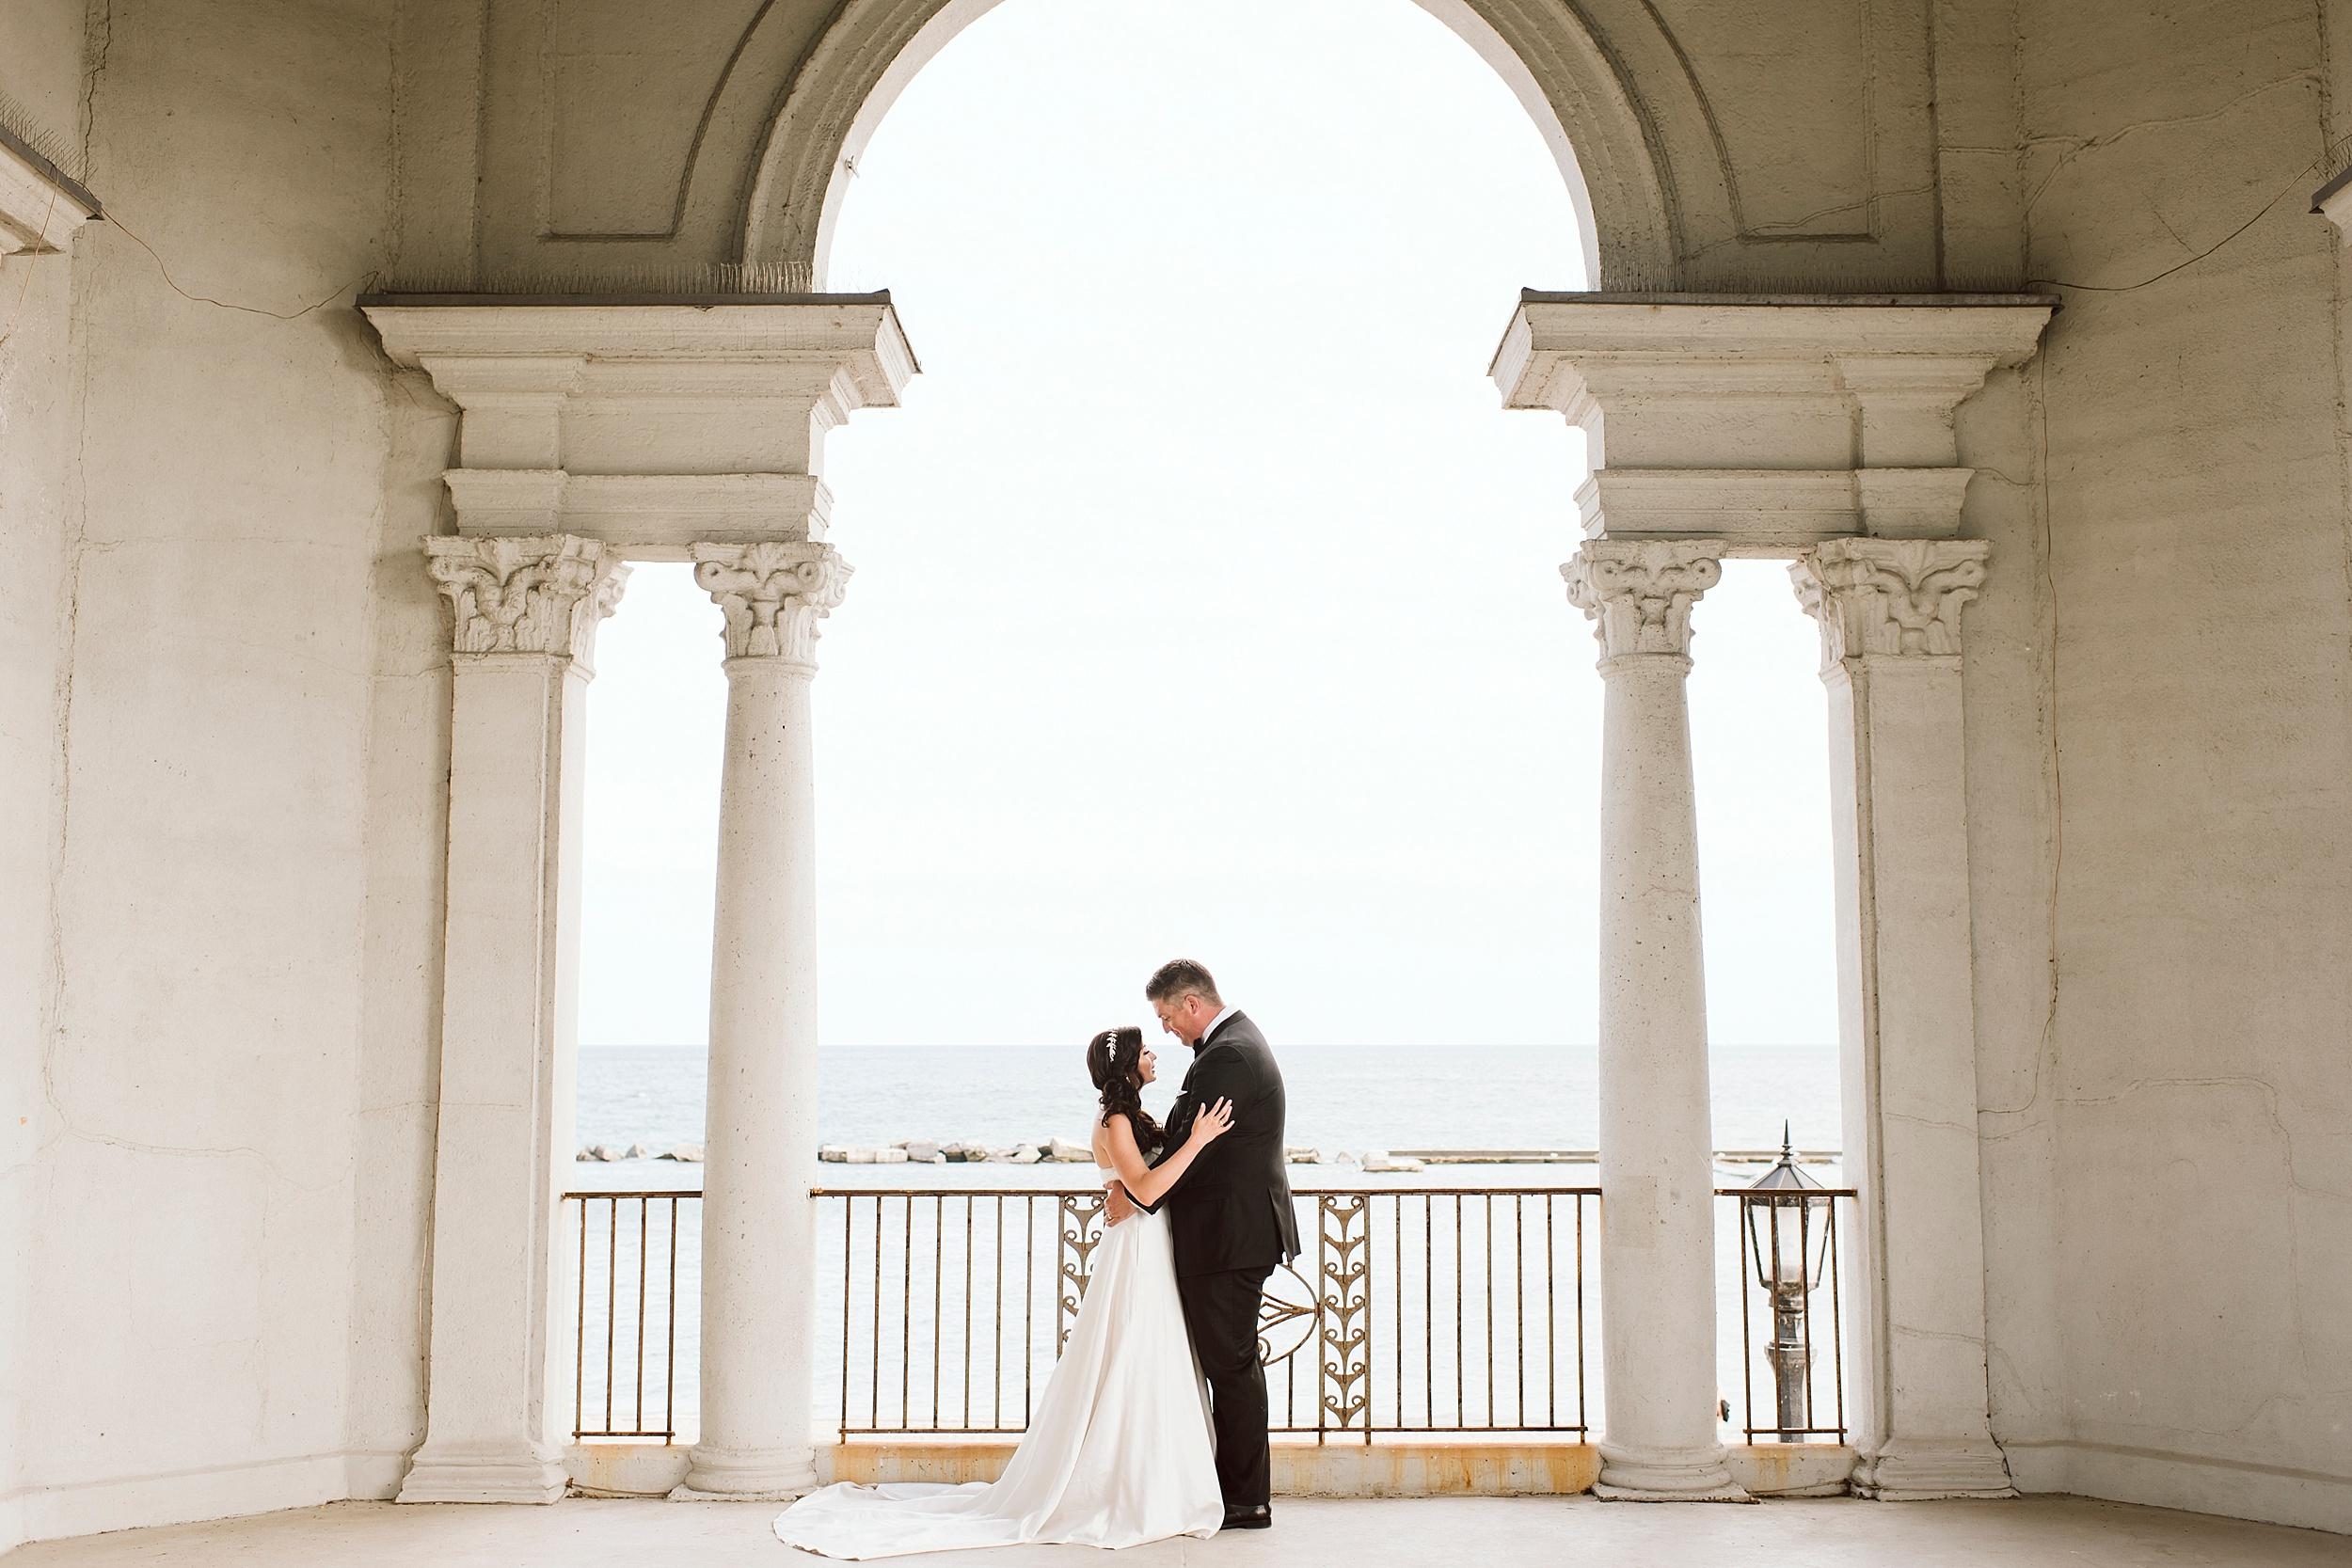 Sunnyside_Pavilion_Wedding_Toronto_Photographer_0053.jpg